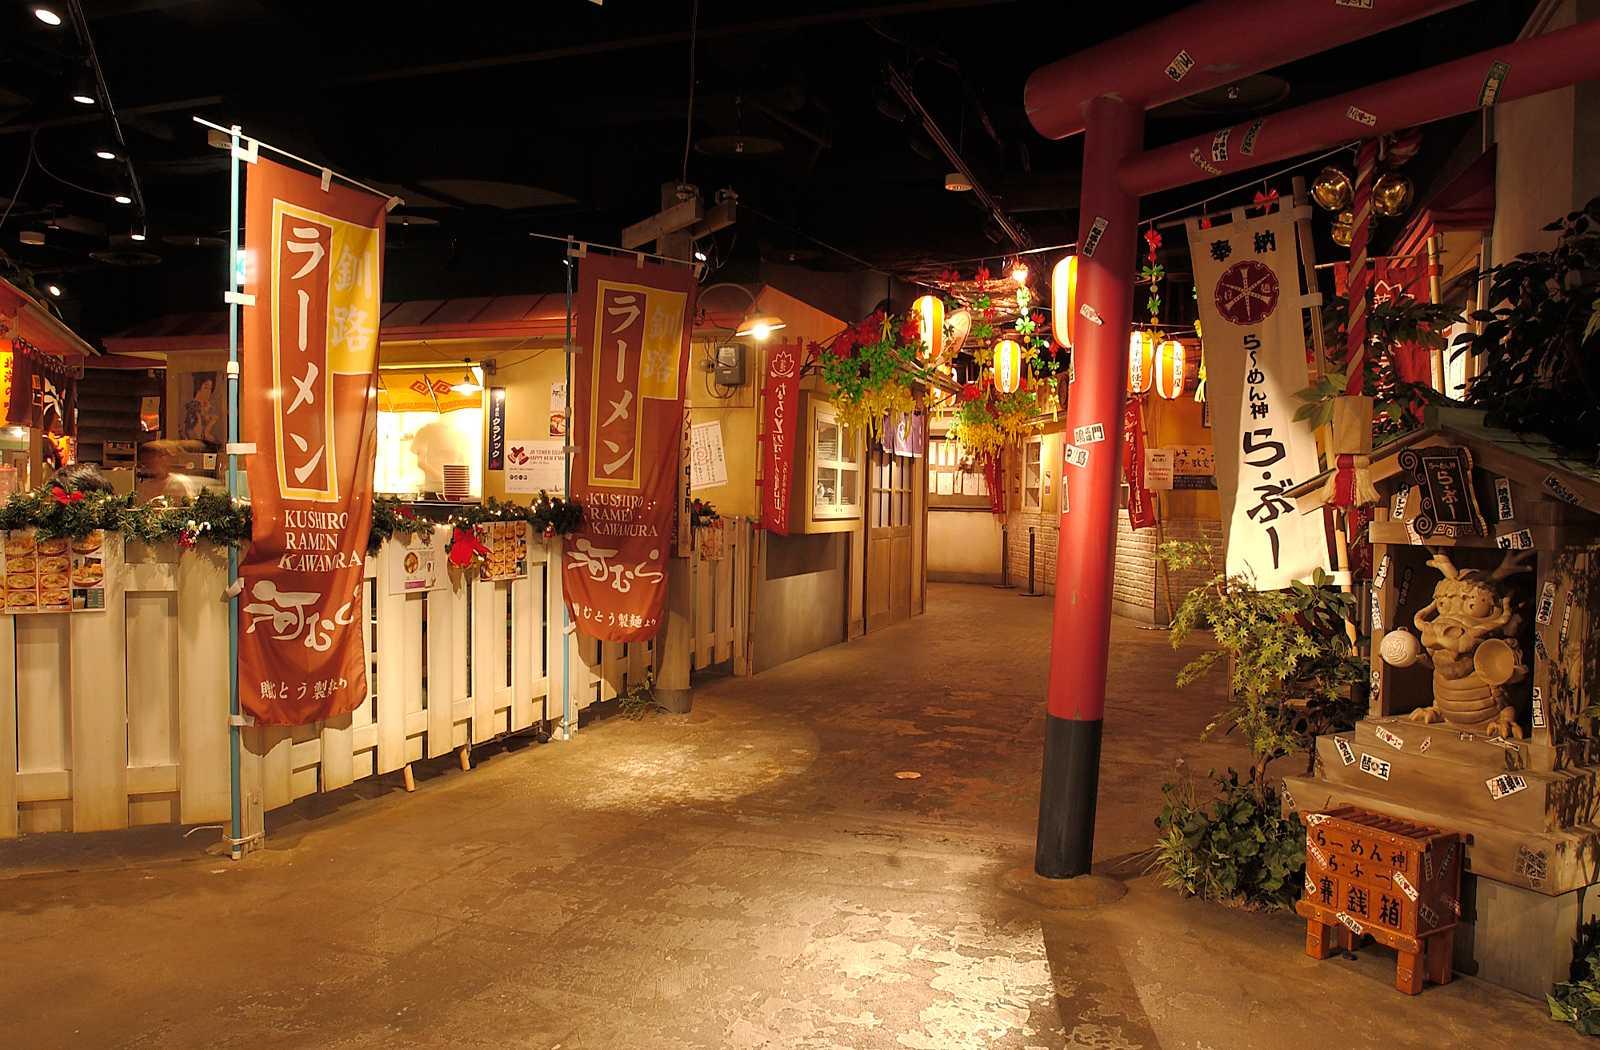 Ramen Street at Sapporo Ramen Republic